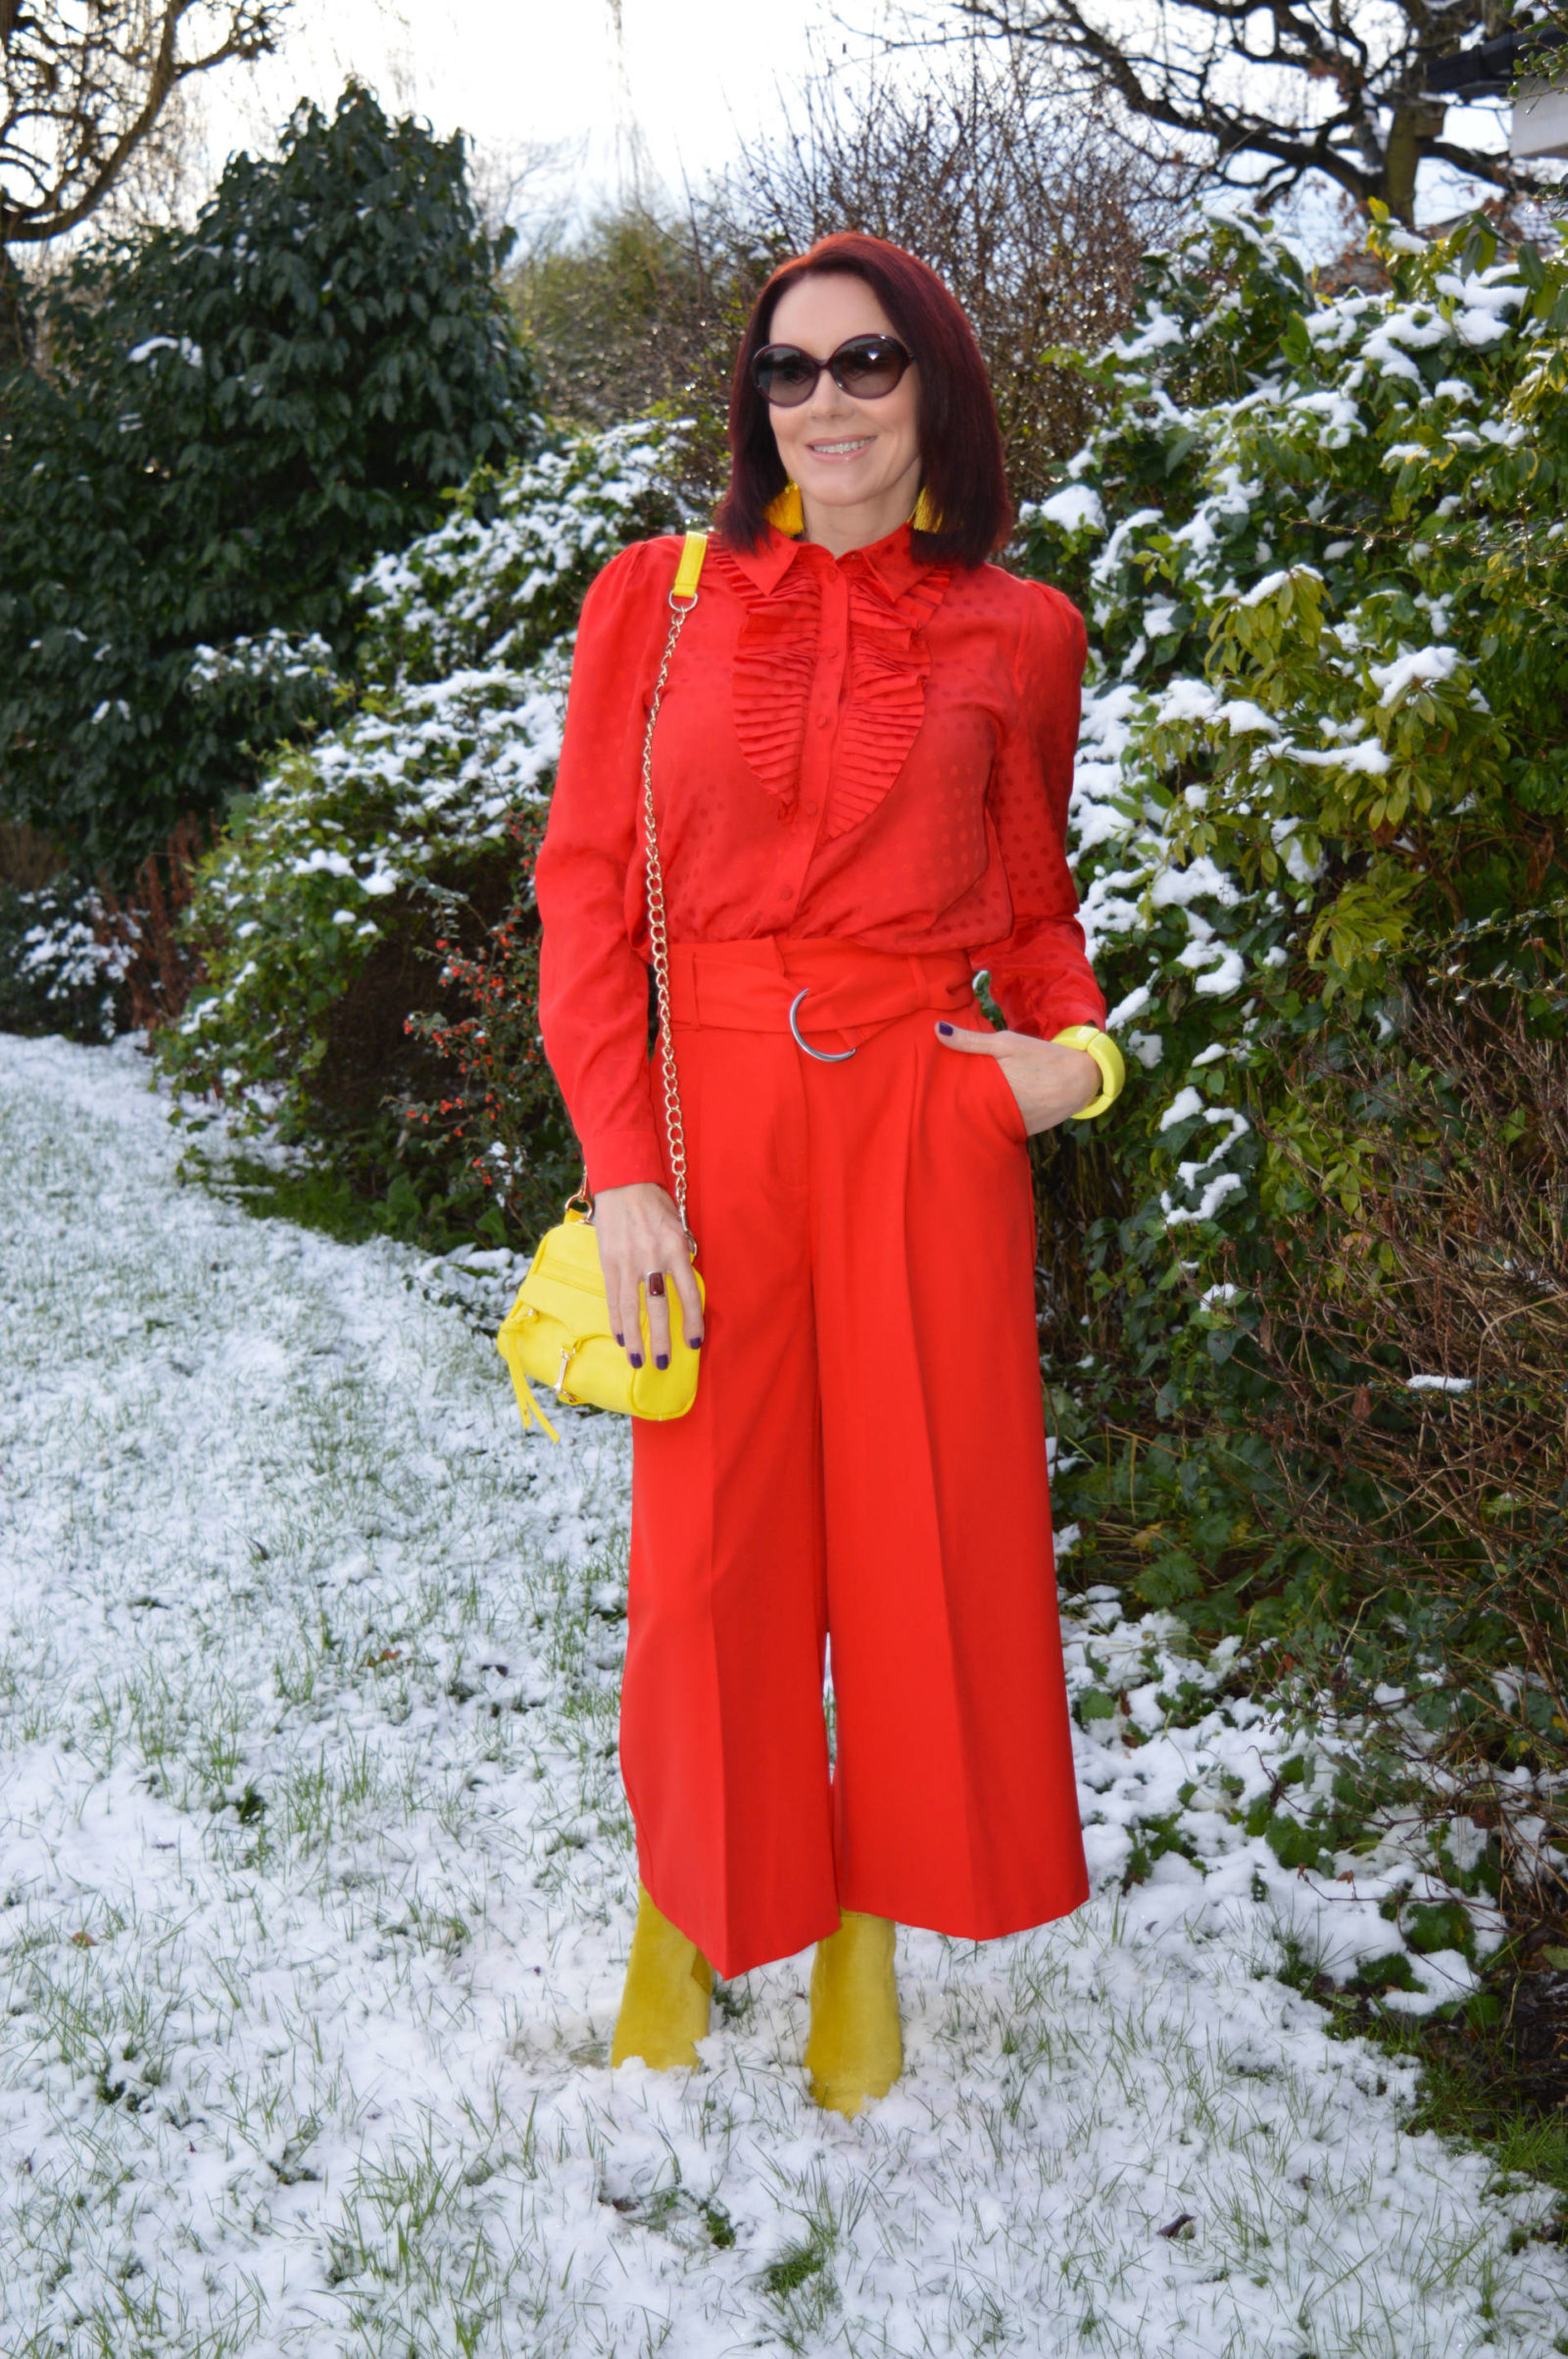 Stylish Mondays - Ladies in Red